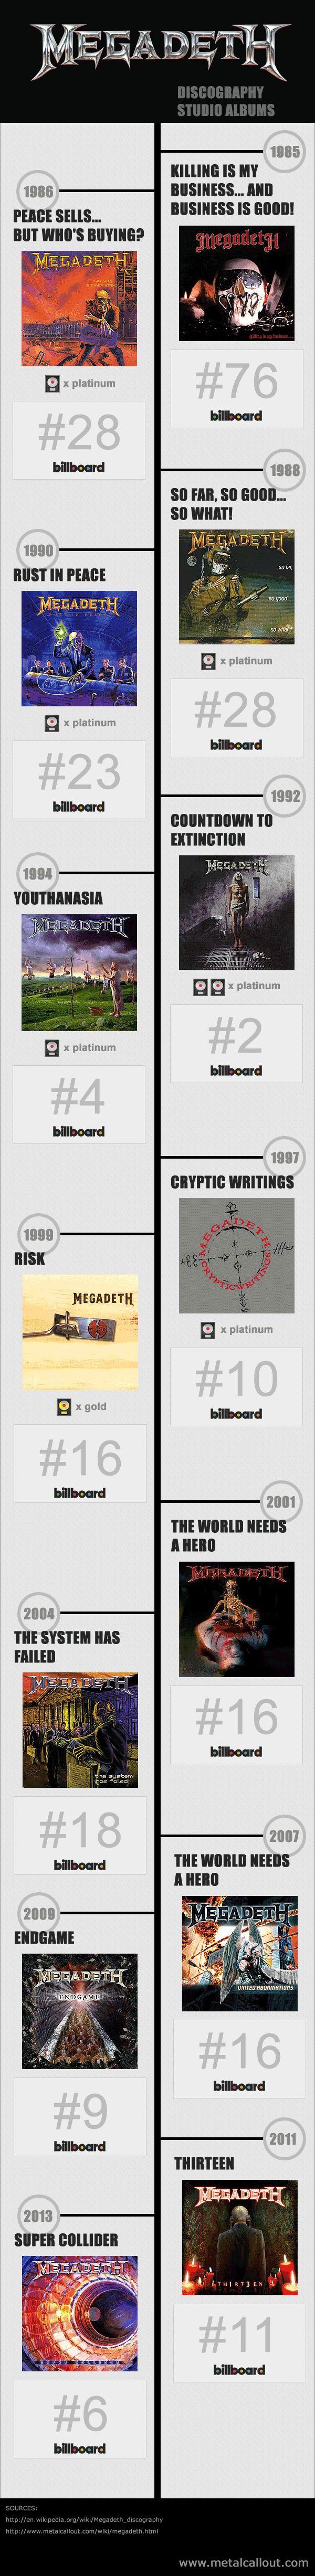 Megadeth Infographic